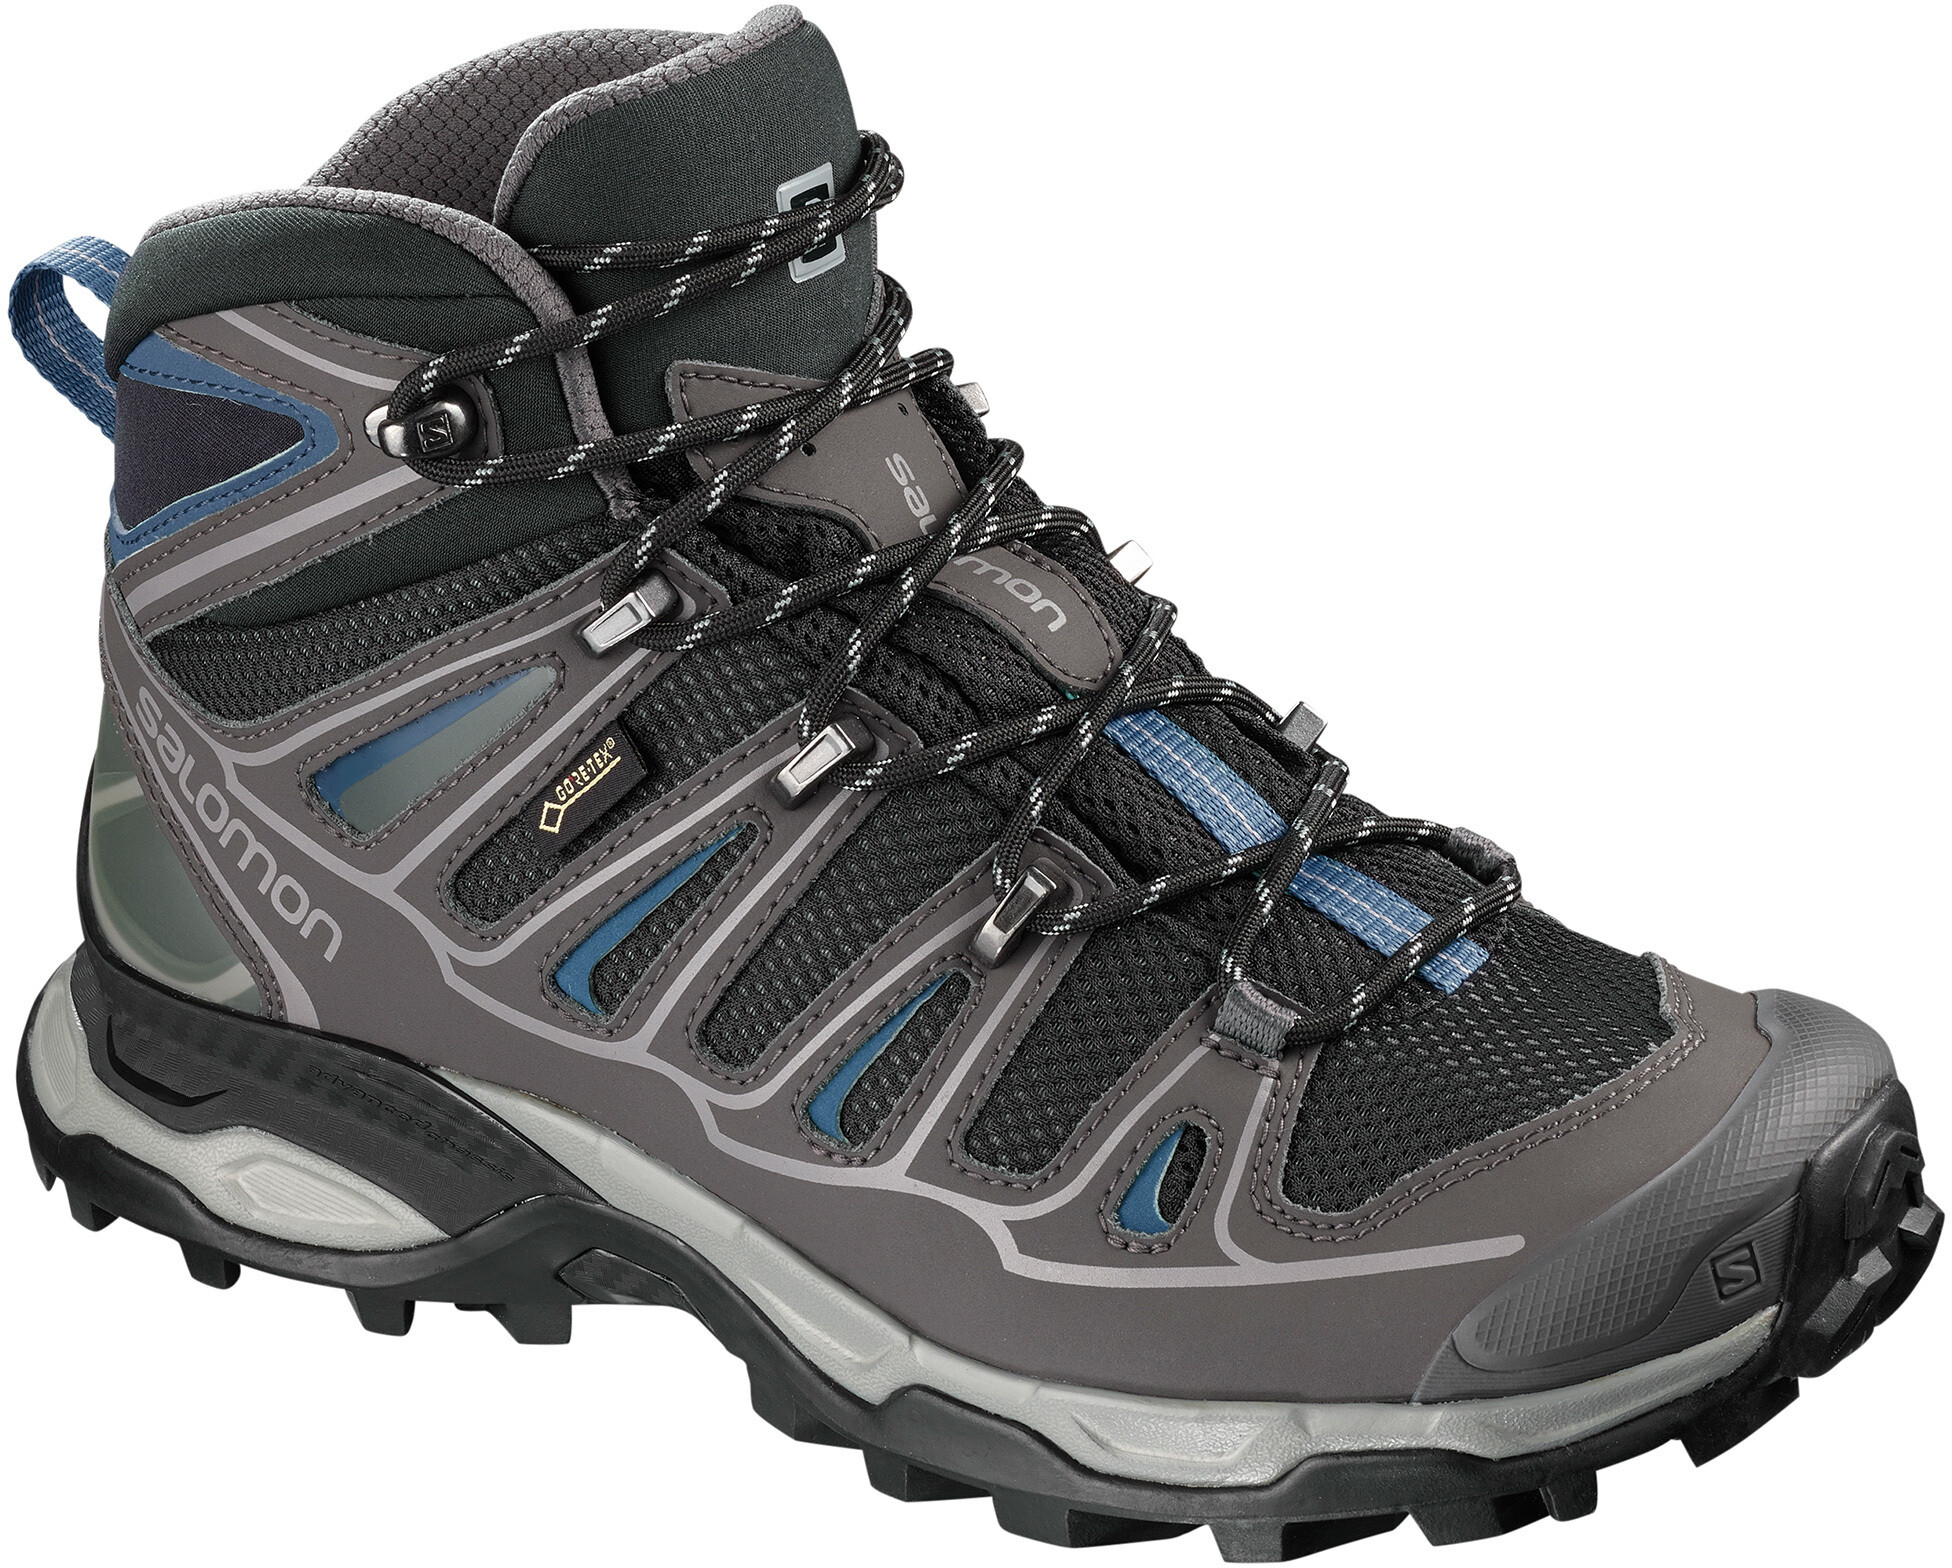 Salomon X Ultra 2 Spikes GTX Mid Shoes Dam BlackMagnetHydro